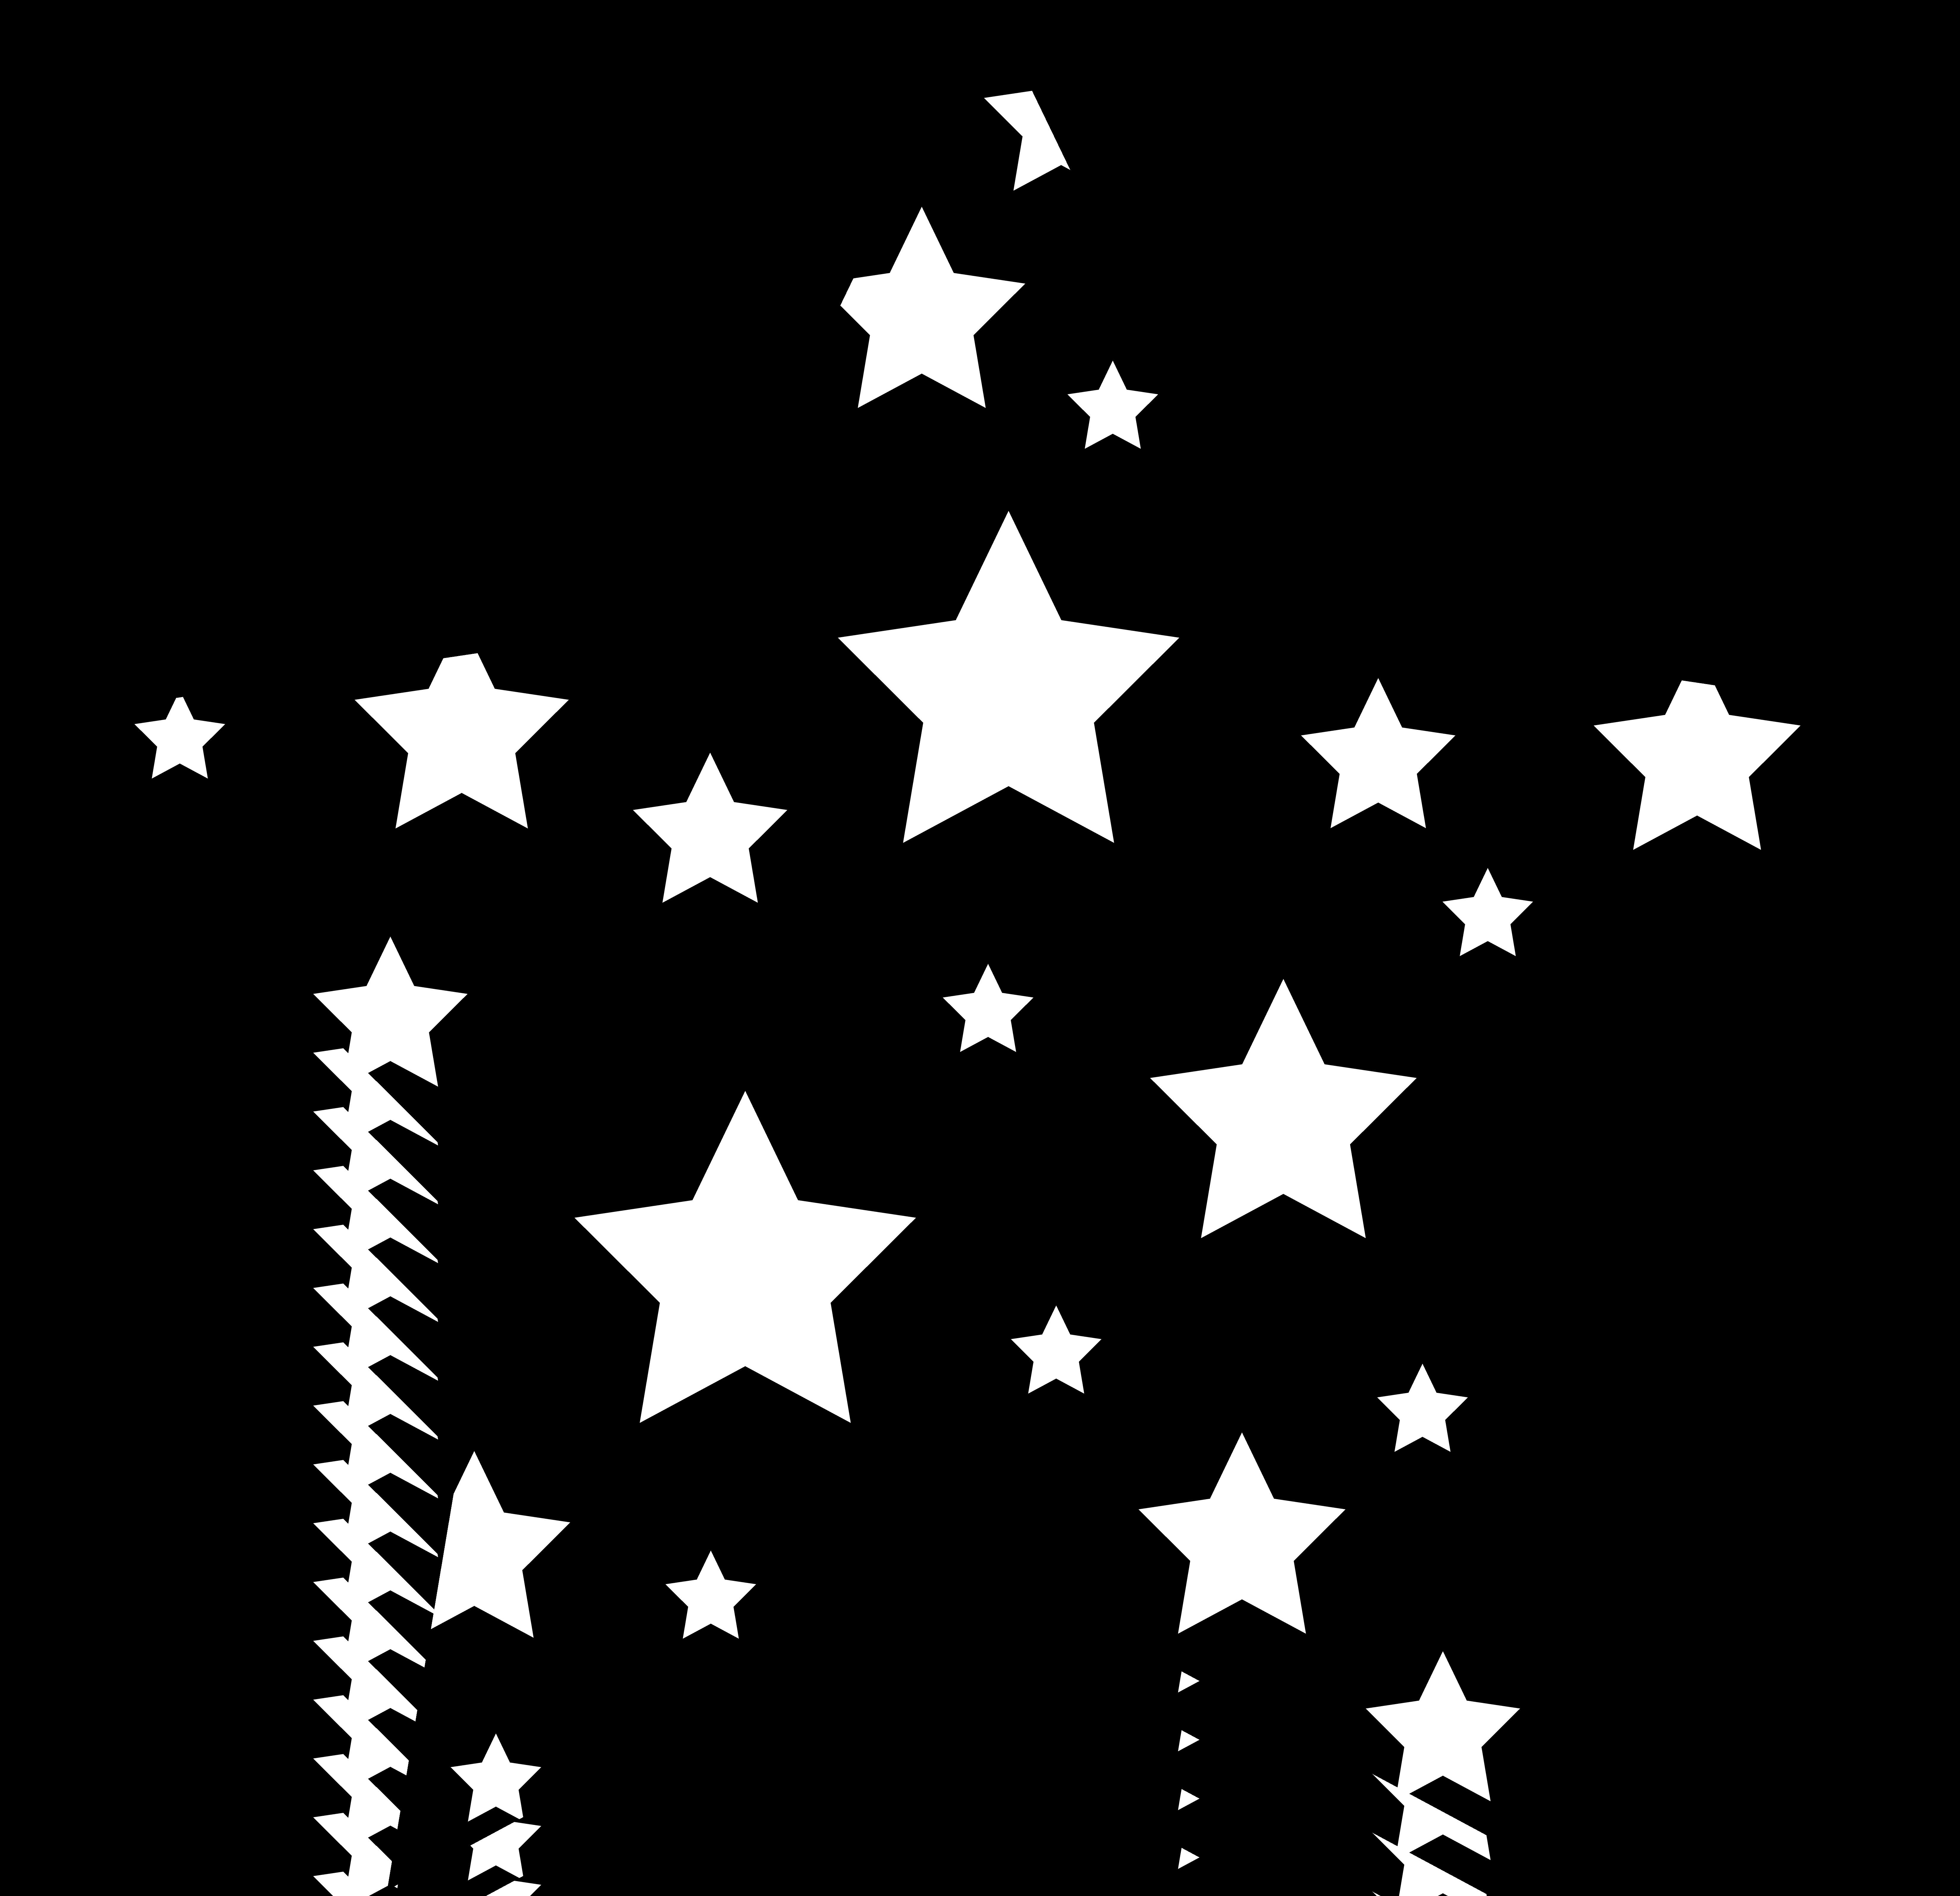 black star borders - photo #36